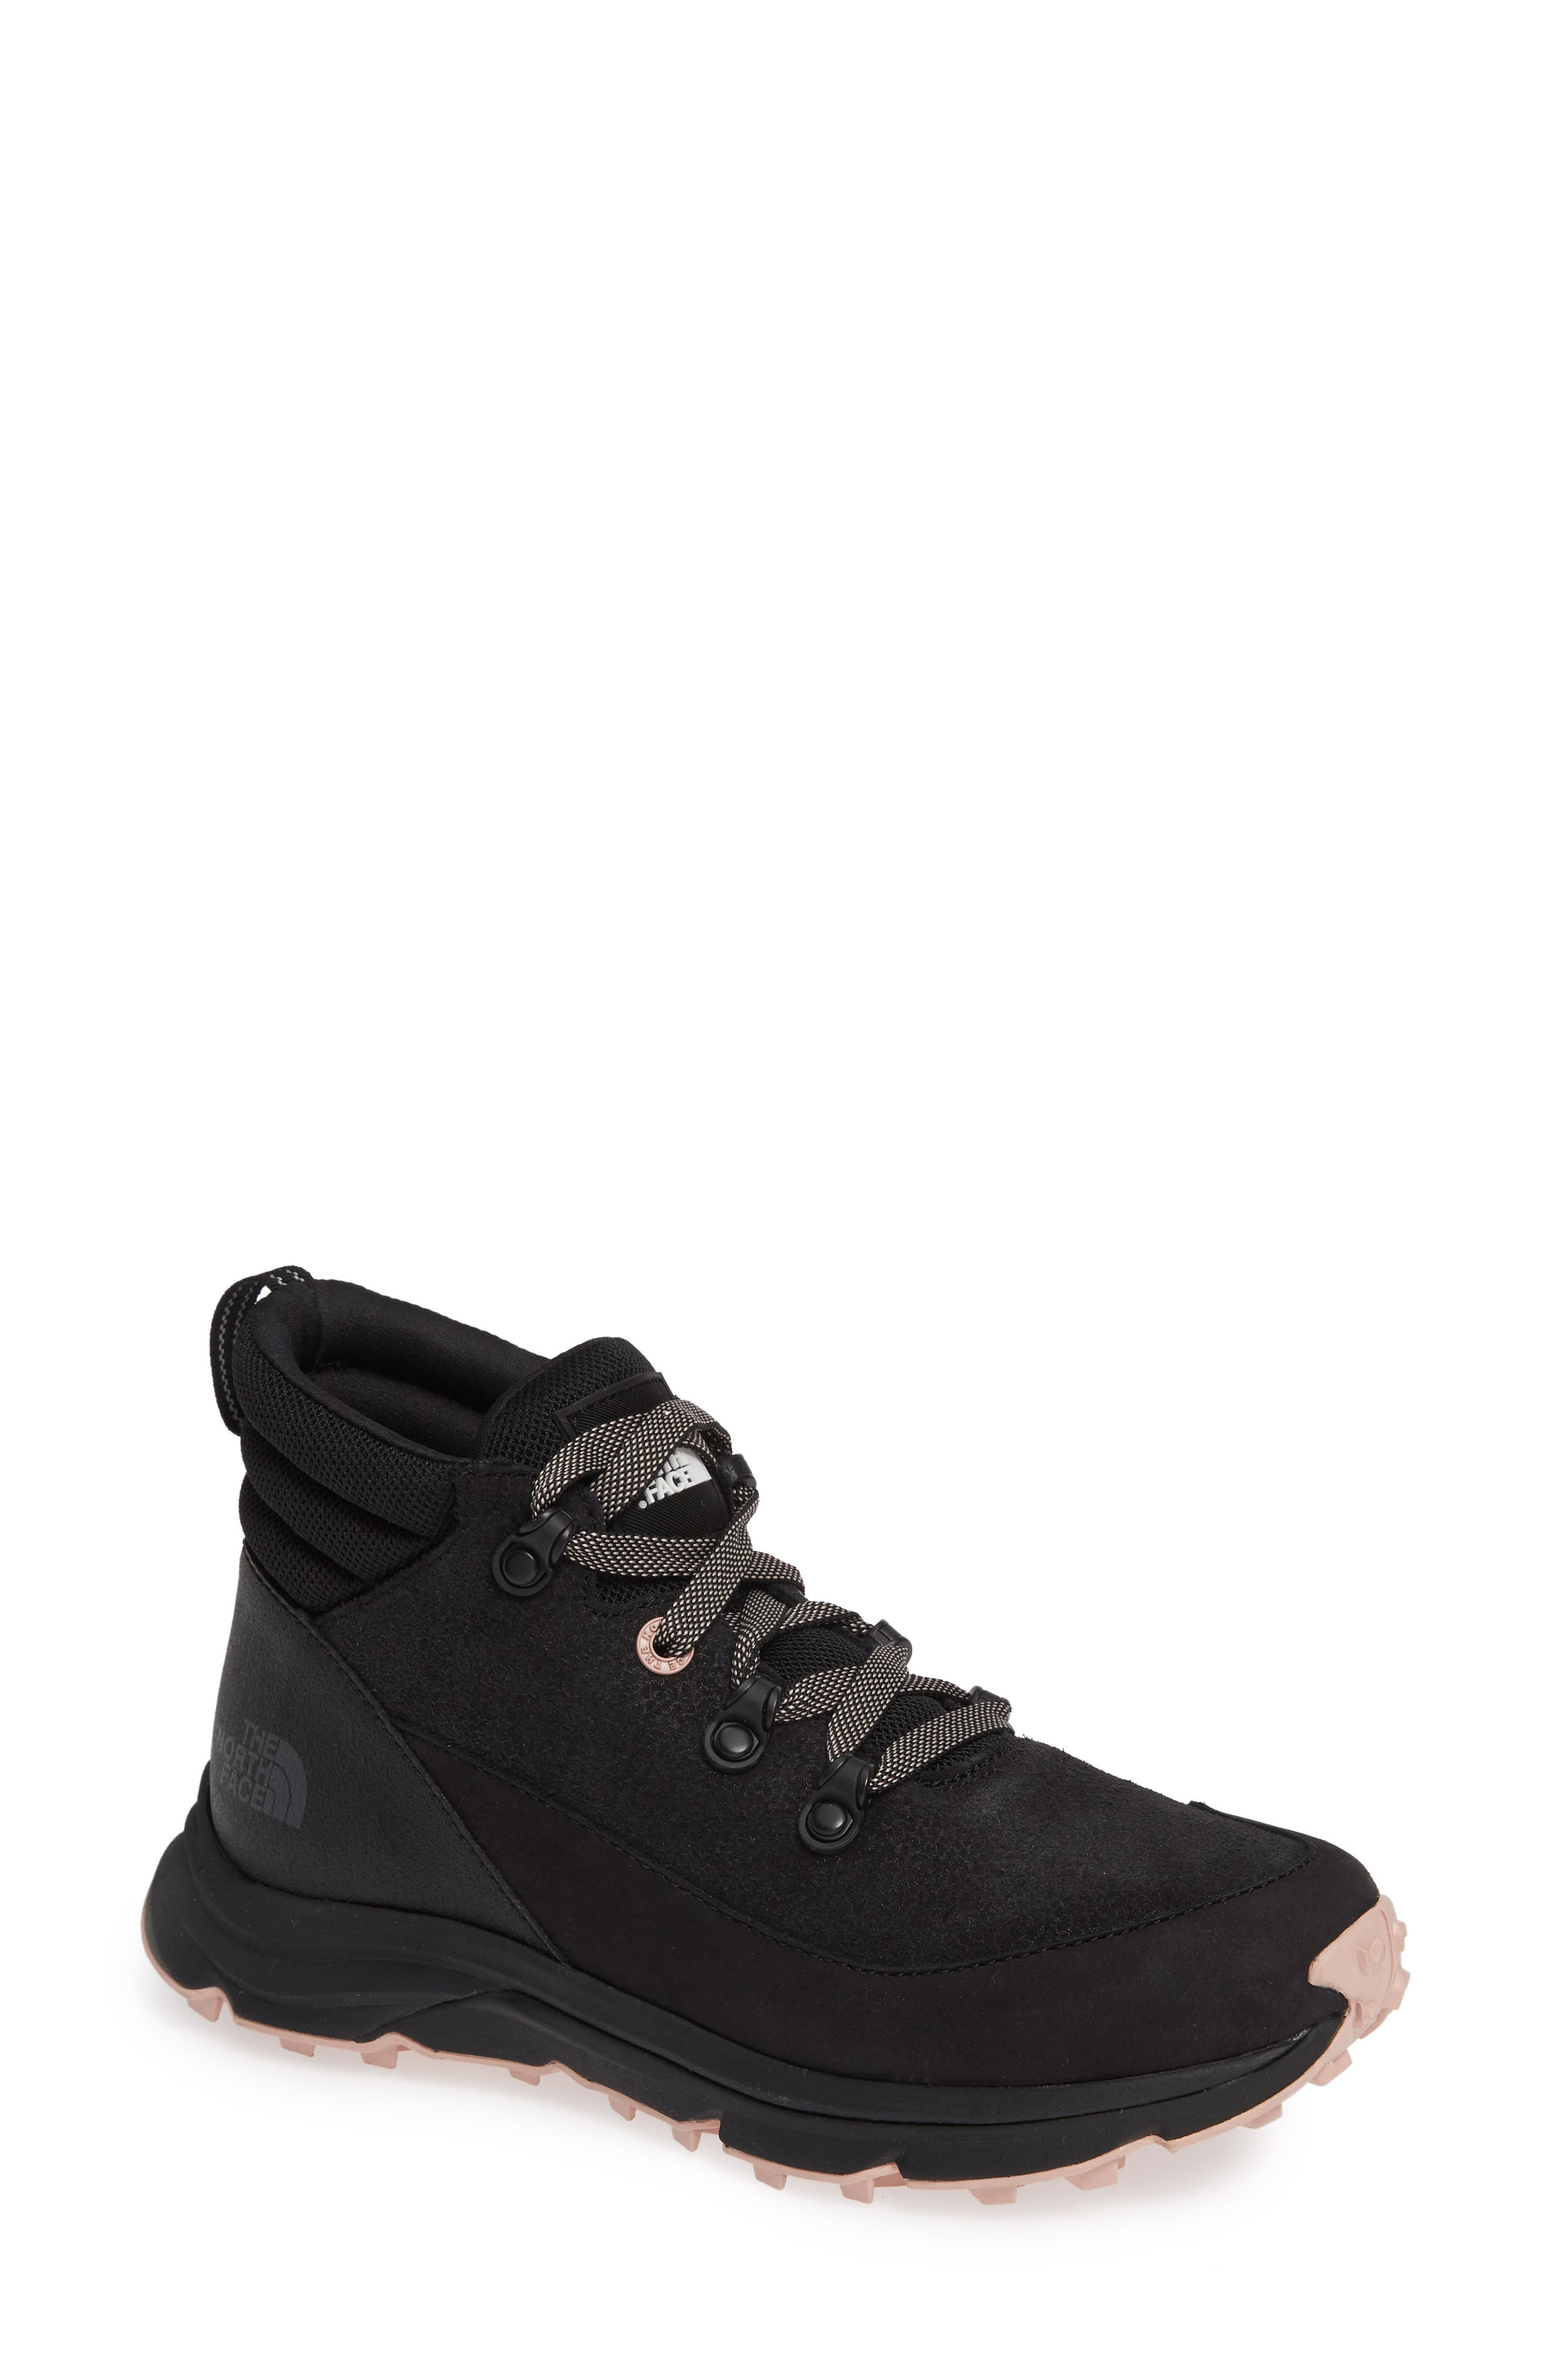 The North Face Raedonda Sneaker Boot- Black